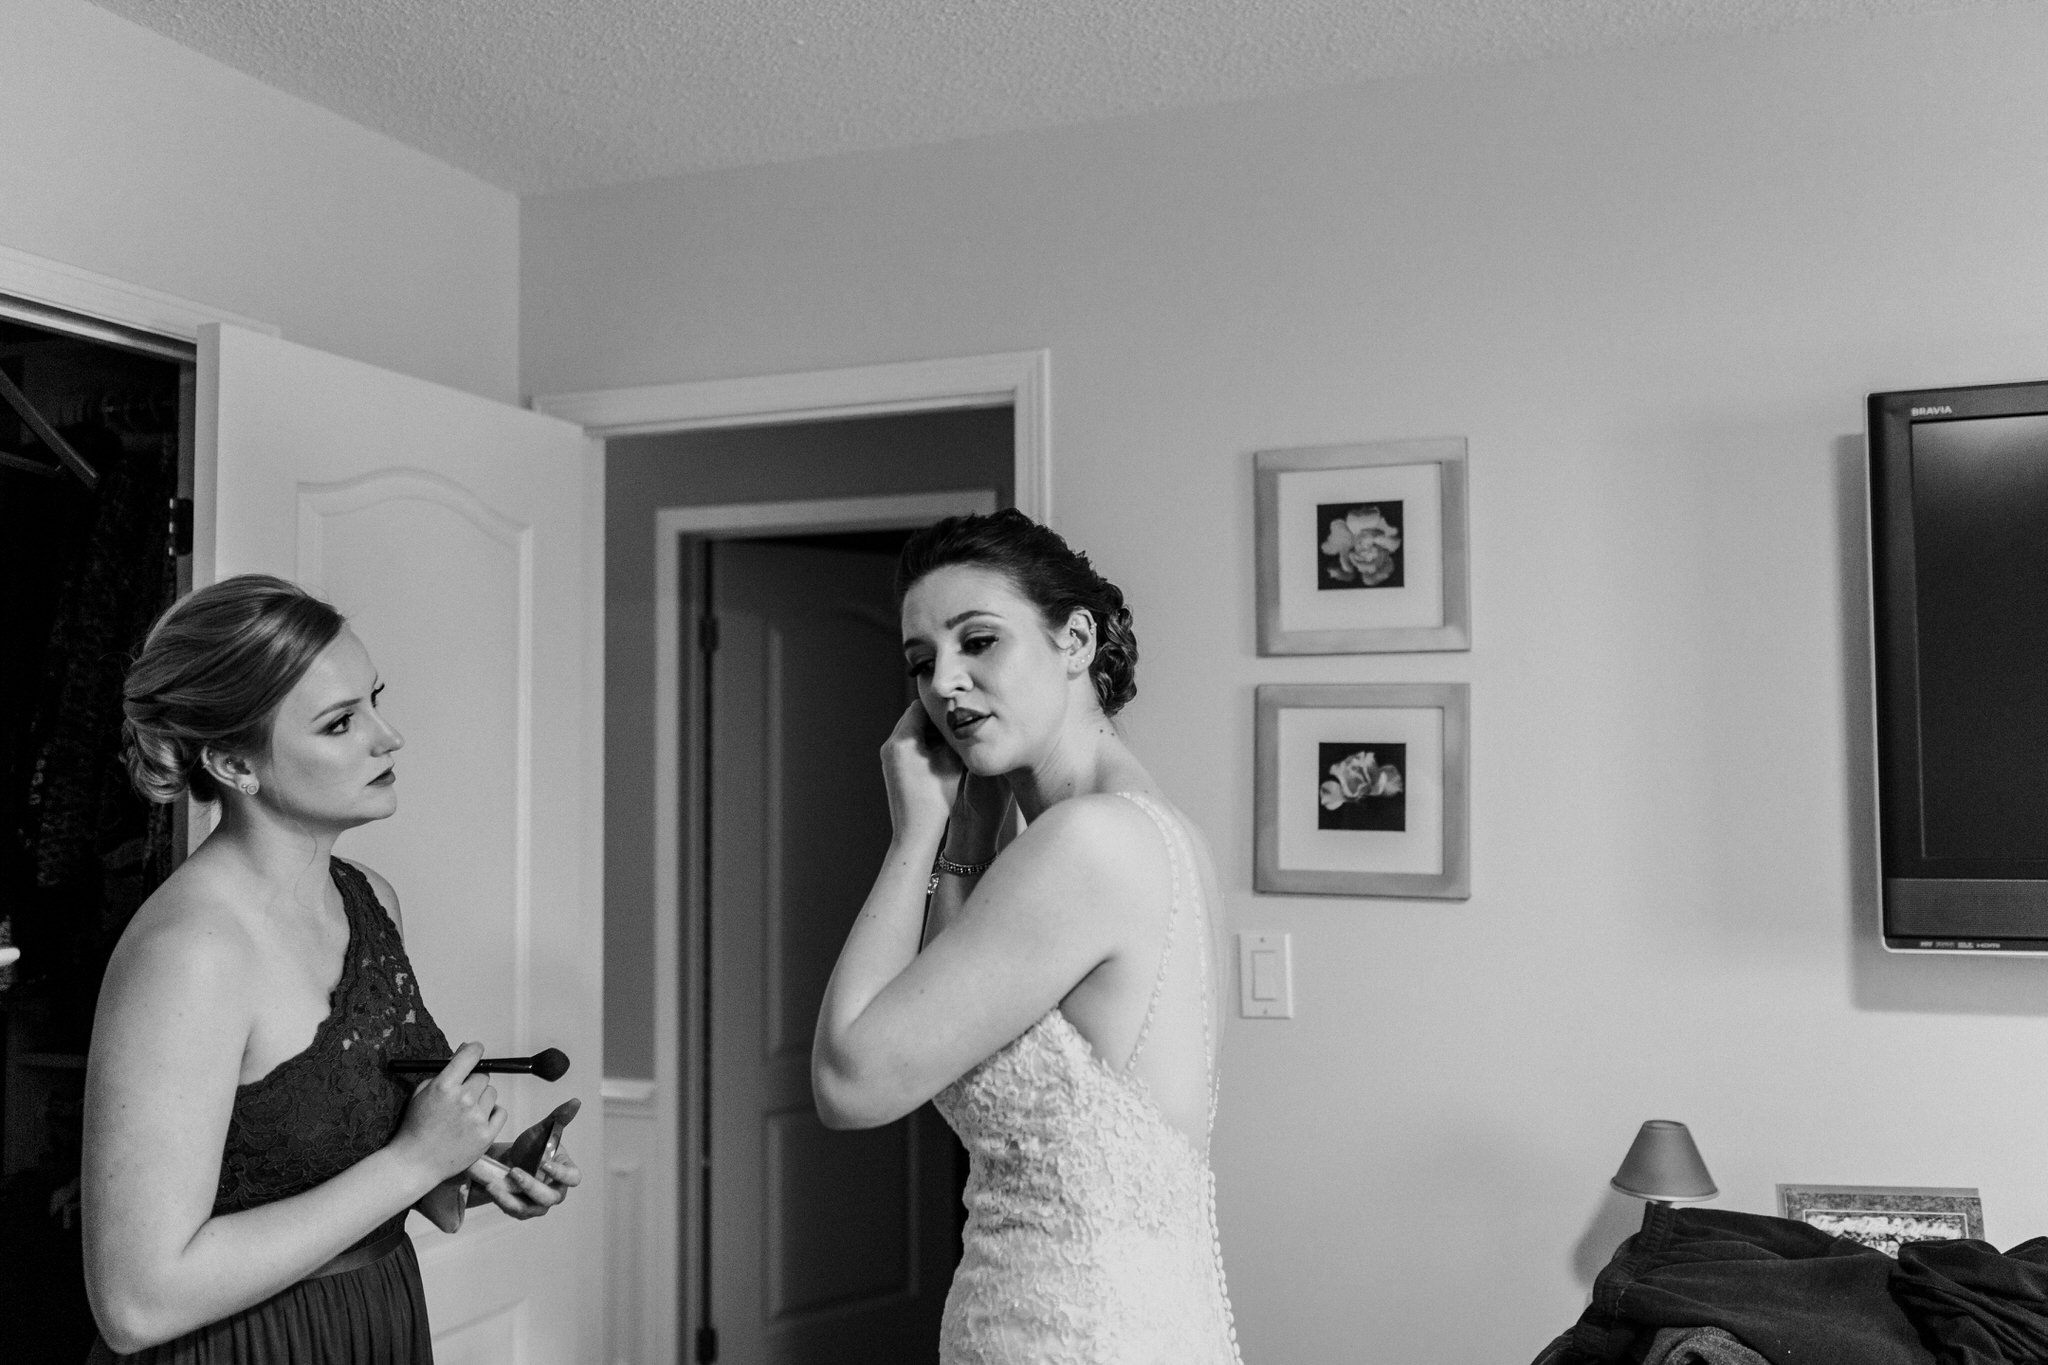 Whitby Documentary Wedding Photographer Carol Poitras - bride getting ready